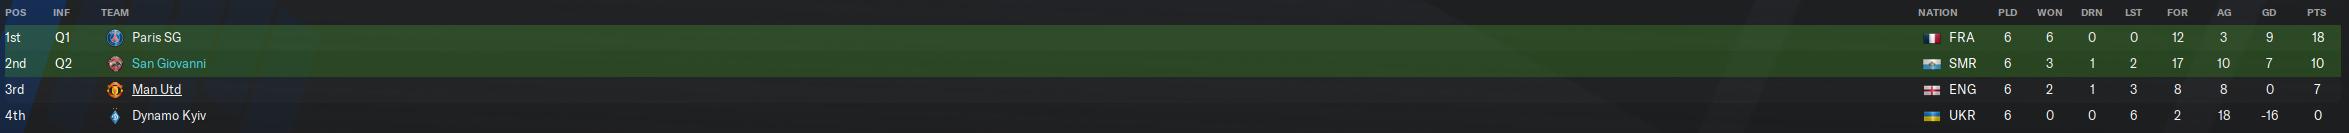 34-35 Euro League.PNG